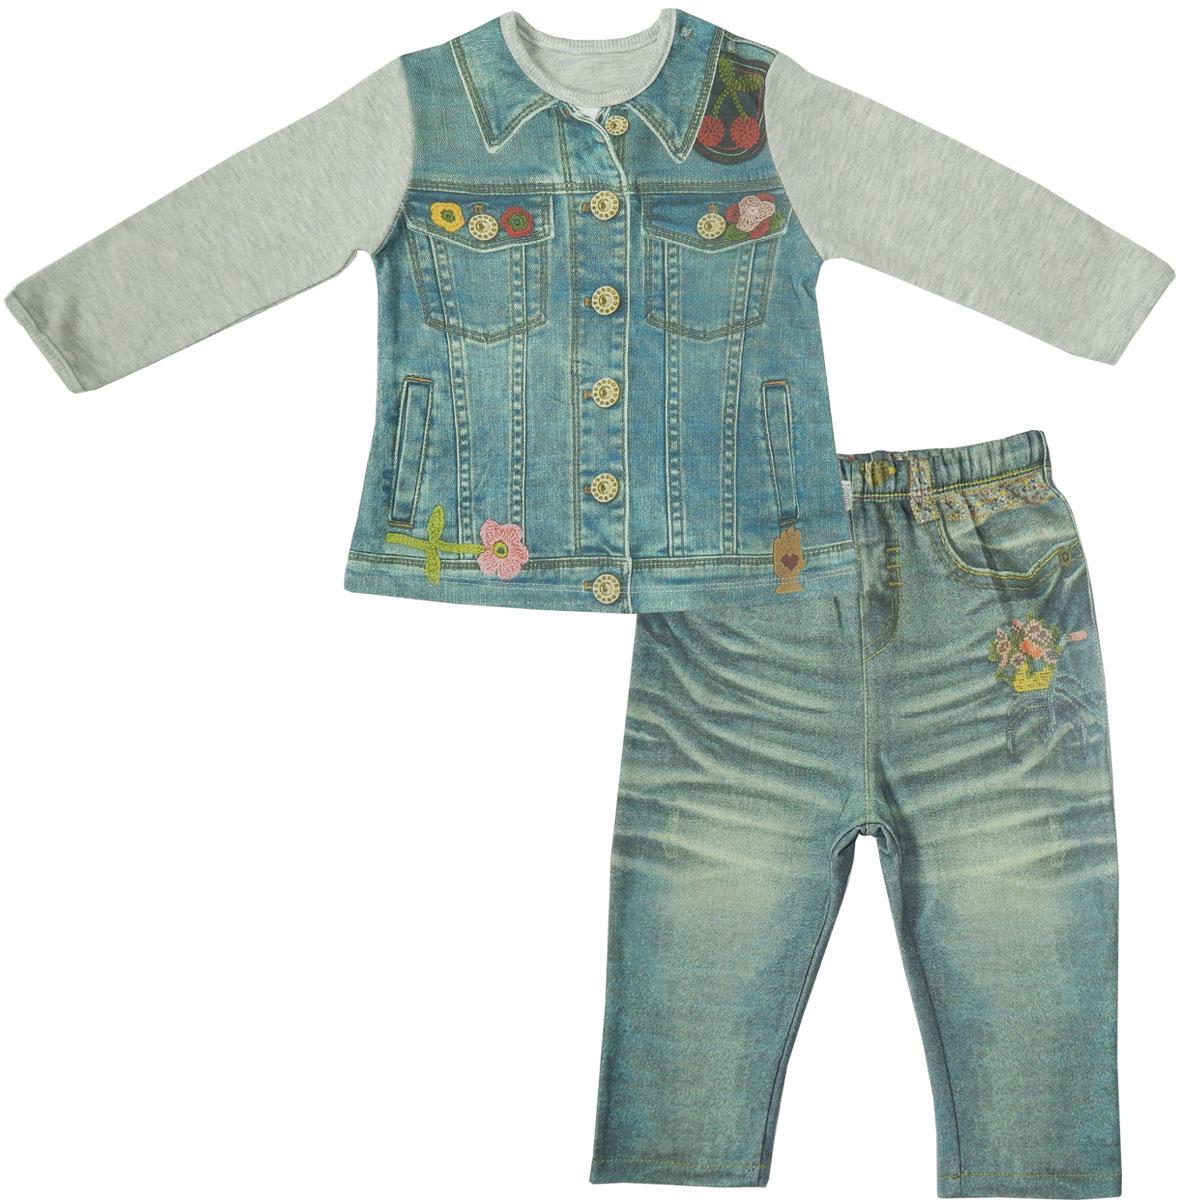 Комплект одежды Папитто для девочки Fashion Jeans 594-05 р.24-80